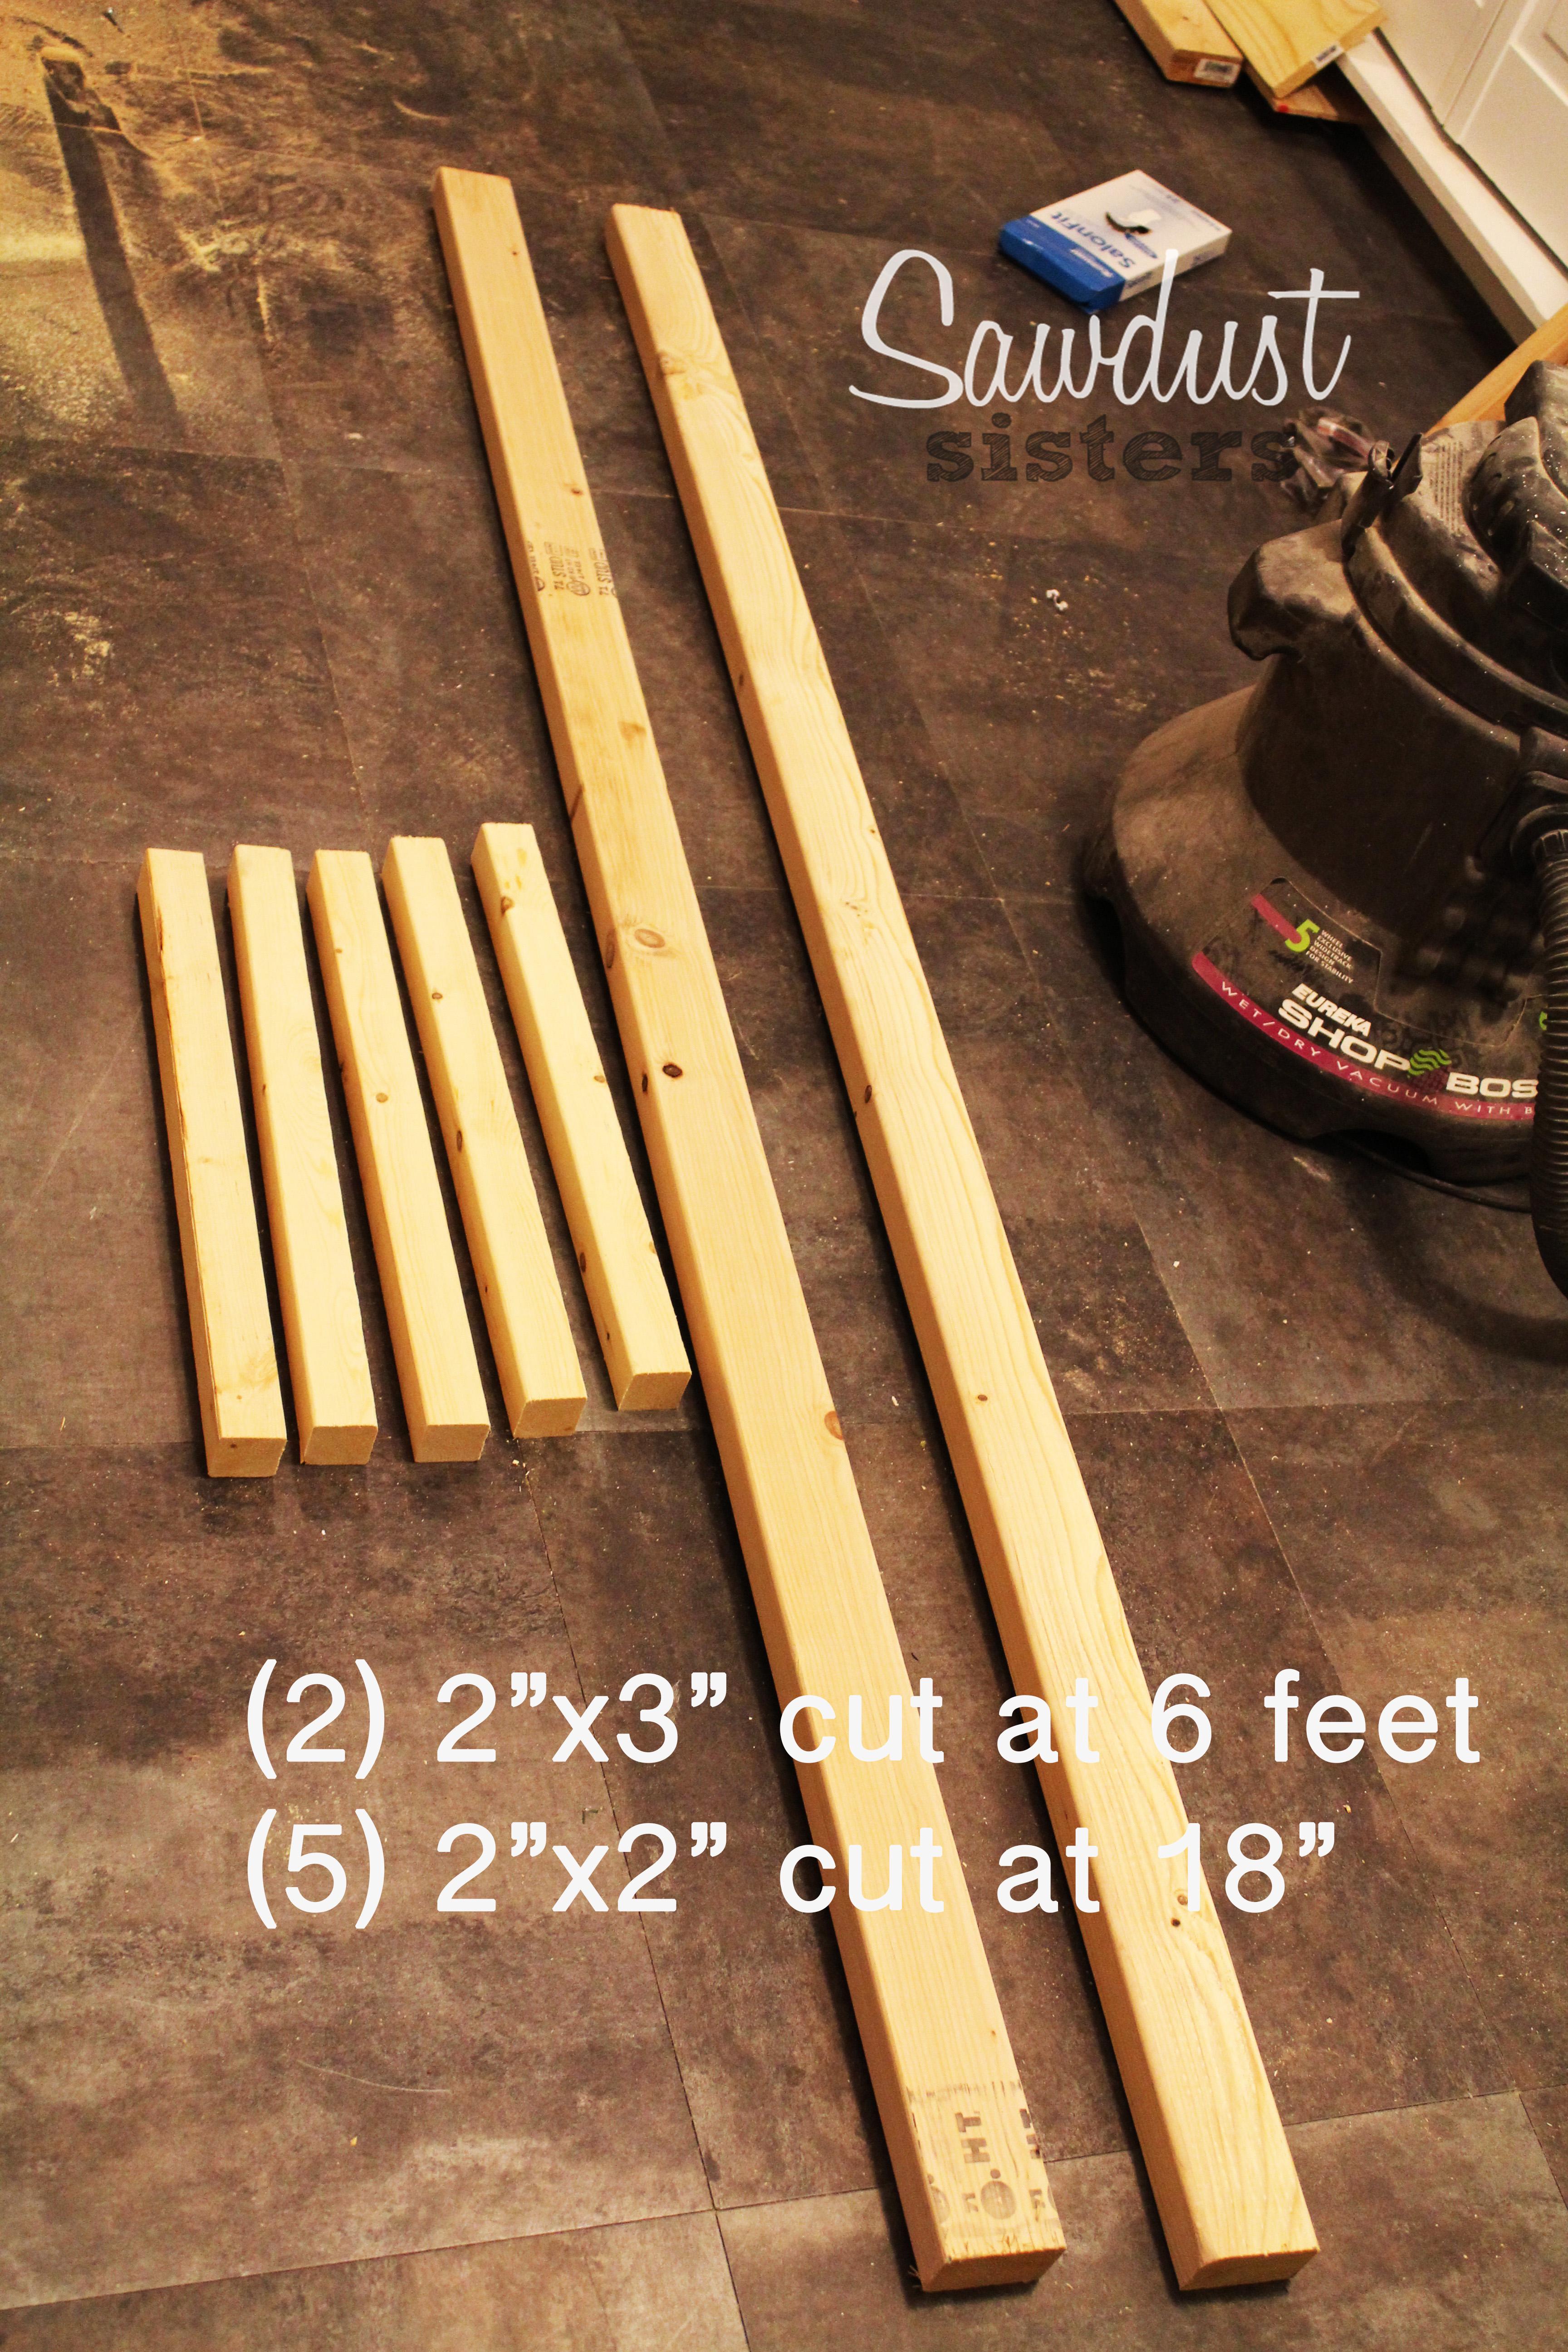 DIY Blanket Ladder. Build it for $6! Sawdustsisters.com